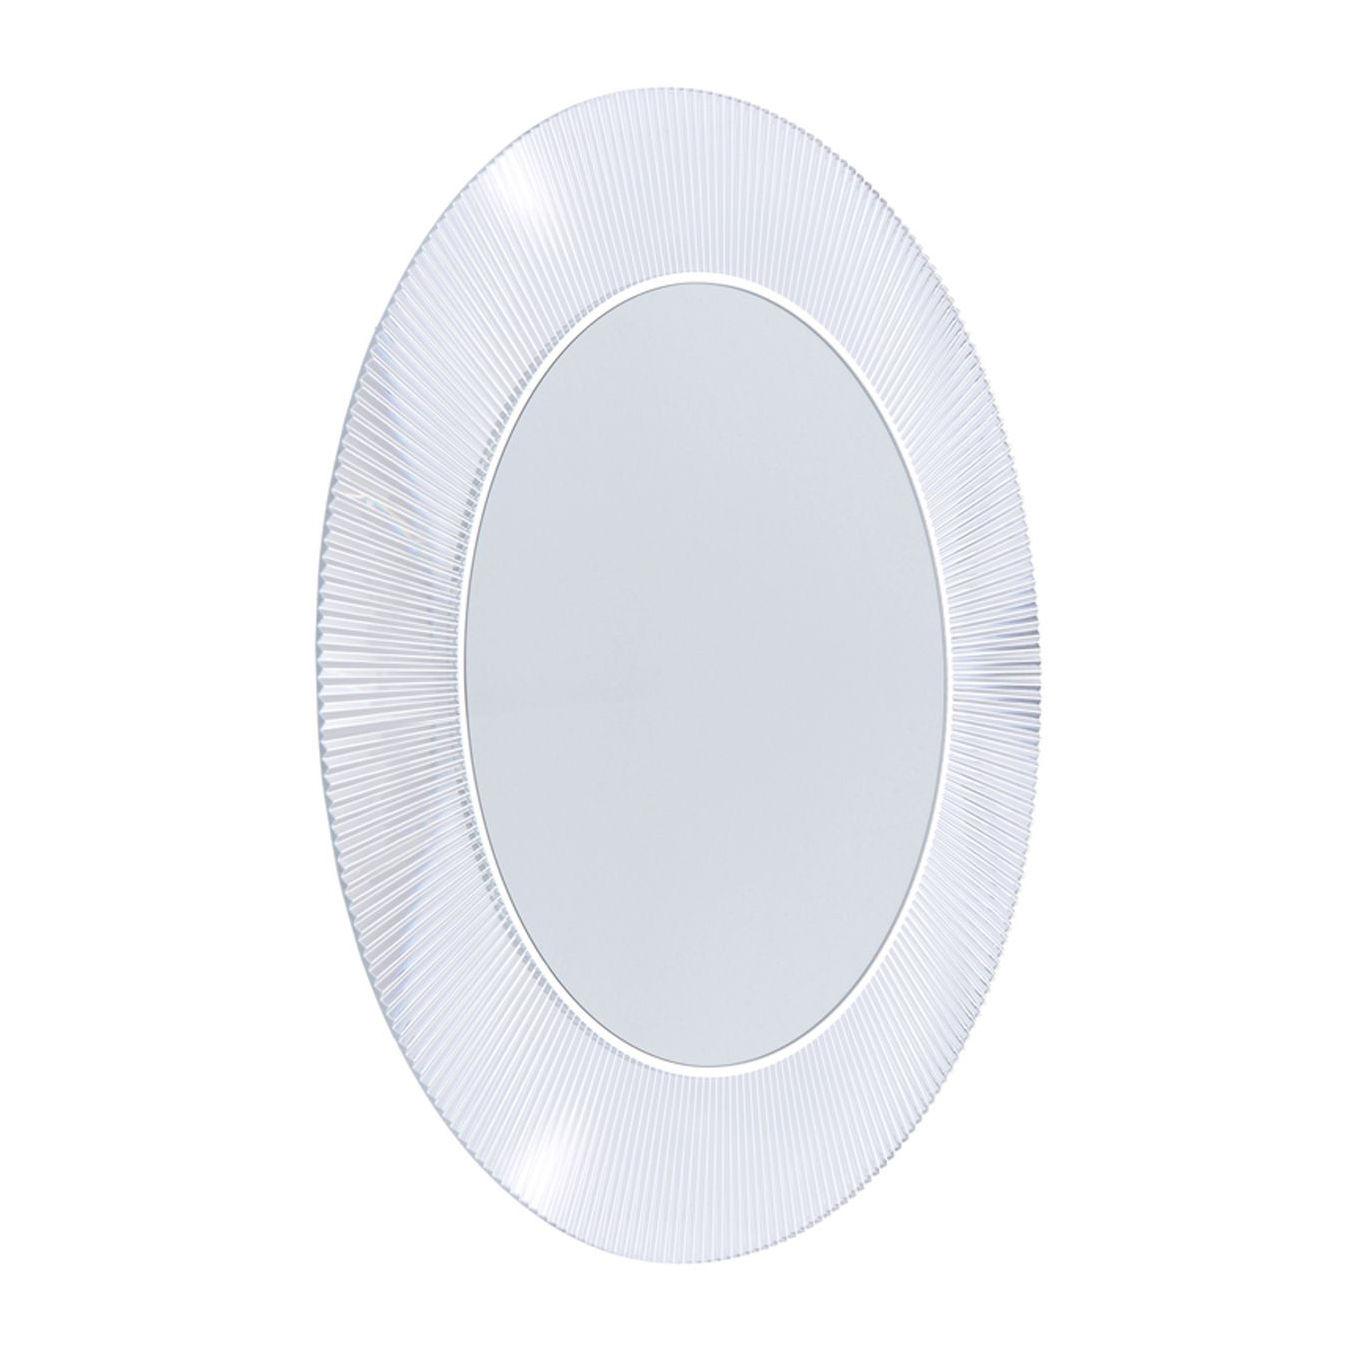 miroir lumineux all saints led 78 cm cristal kartell. Black Bedroom Furniture Sets. Home Design Ideas